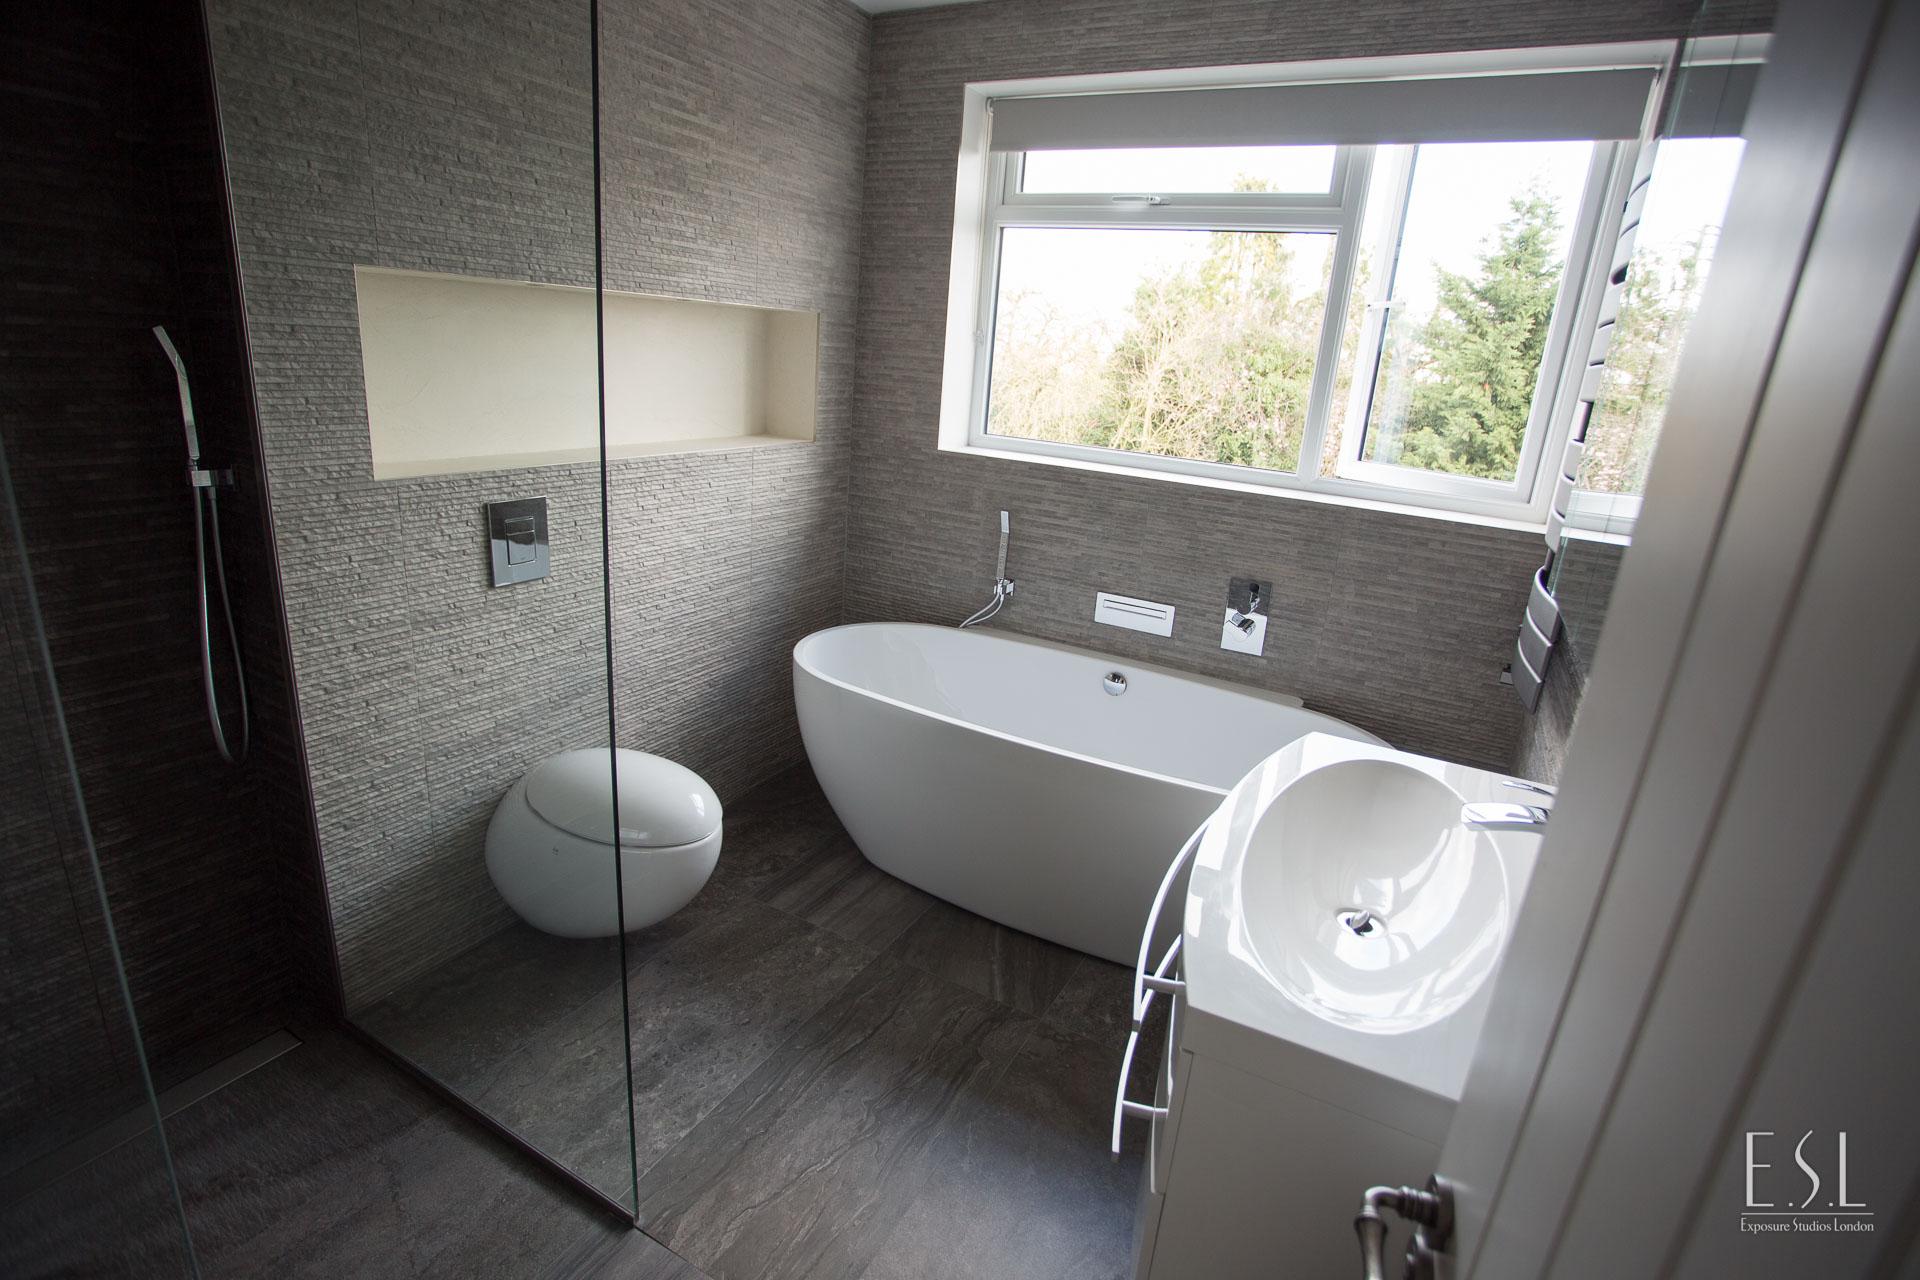 Builders, Winchmore Hill, London House rennovation & Refurbishment 05